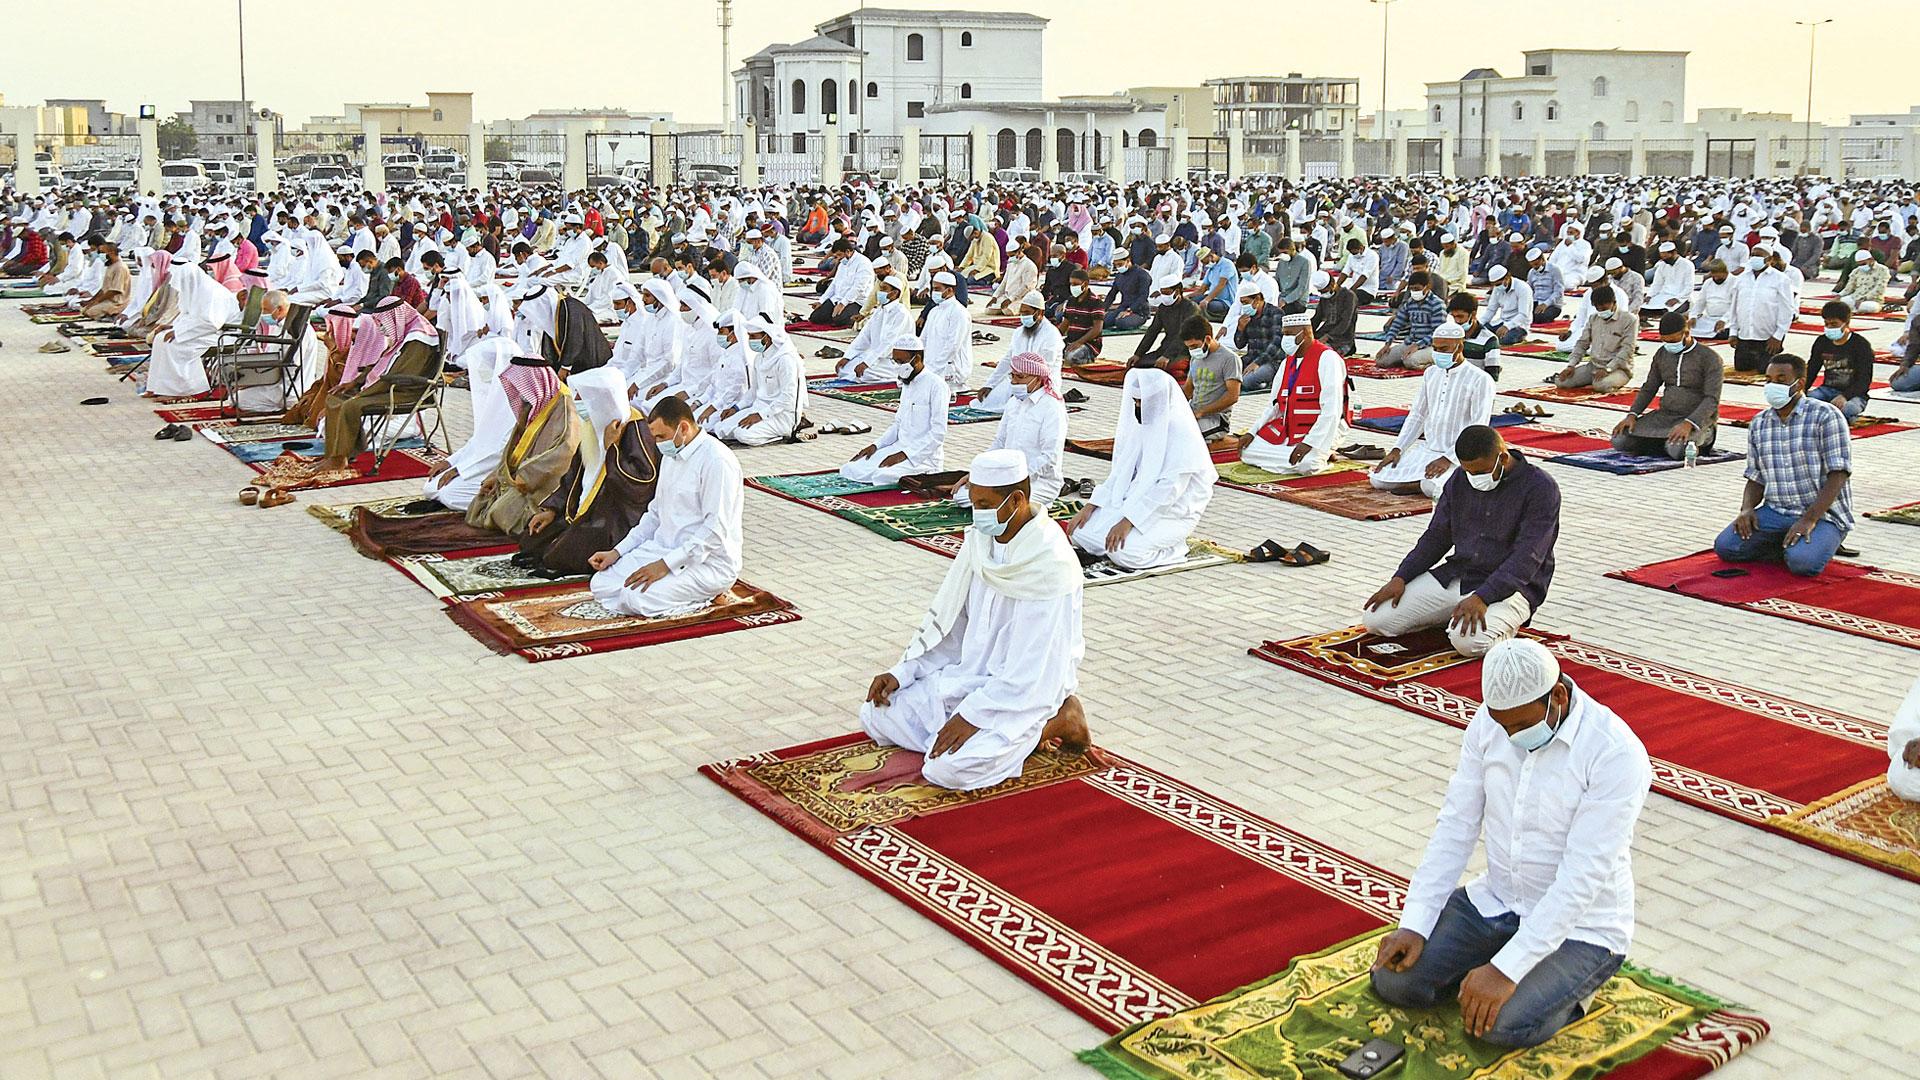 Awqaf Ministry Prepares More Than 900 Mosques, Praying Areas for Eid Al-Adha Prayers